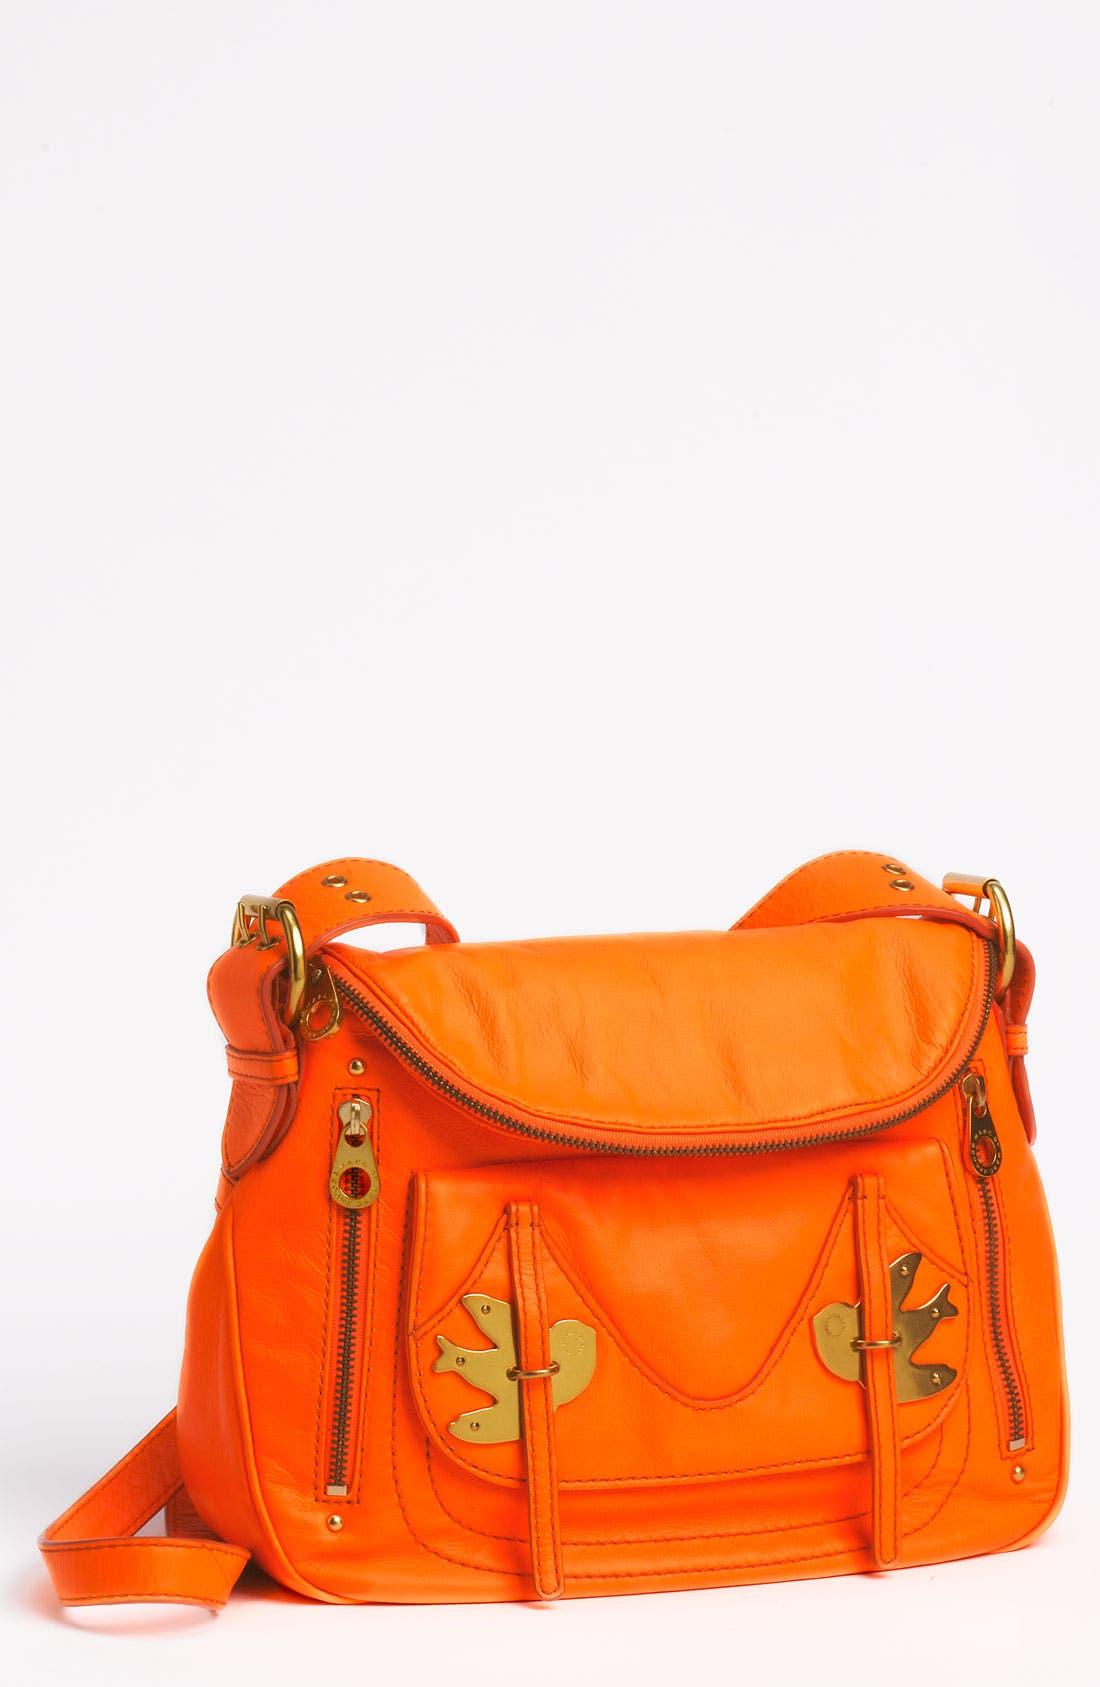 Main Image - MARC BY MARC JACOBS 'Petal to the Metal - Natasha' Flap Crossbody Bag, Medium